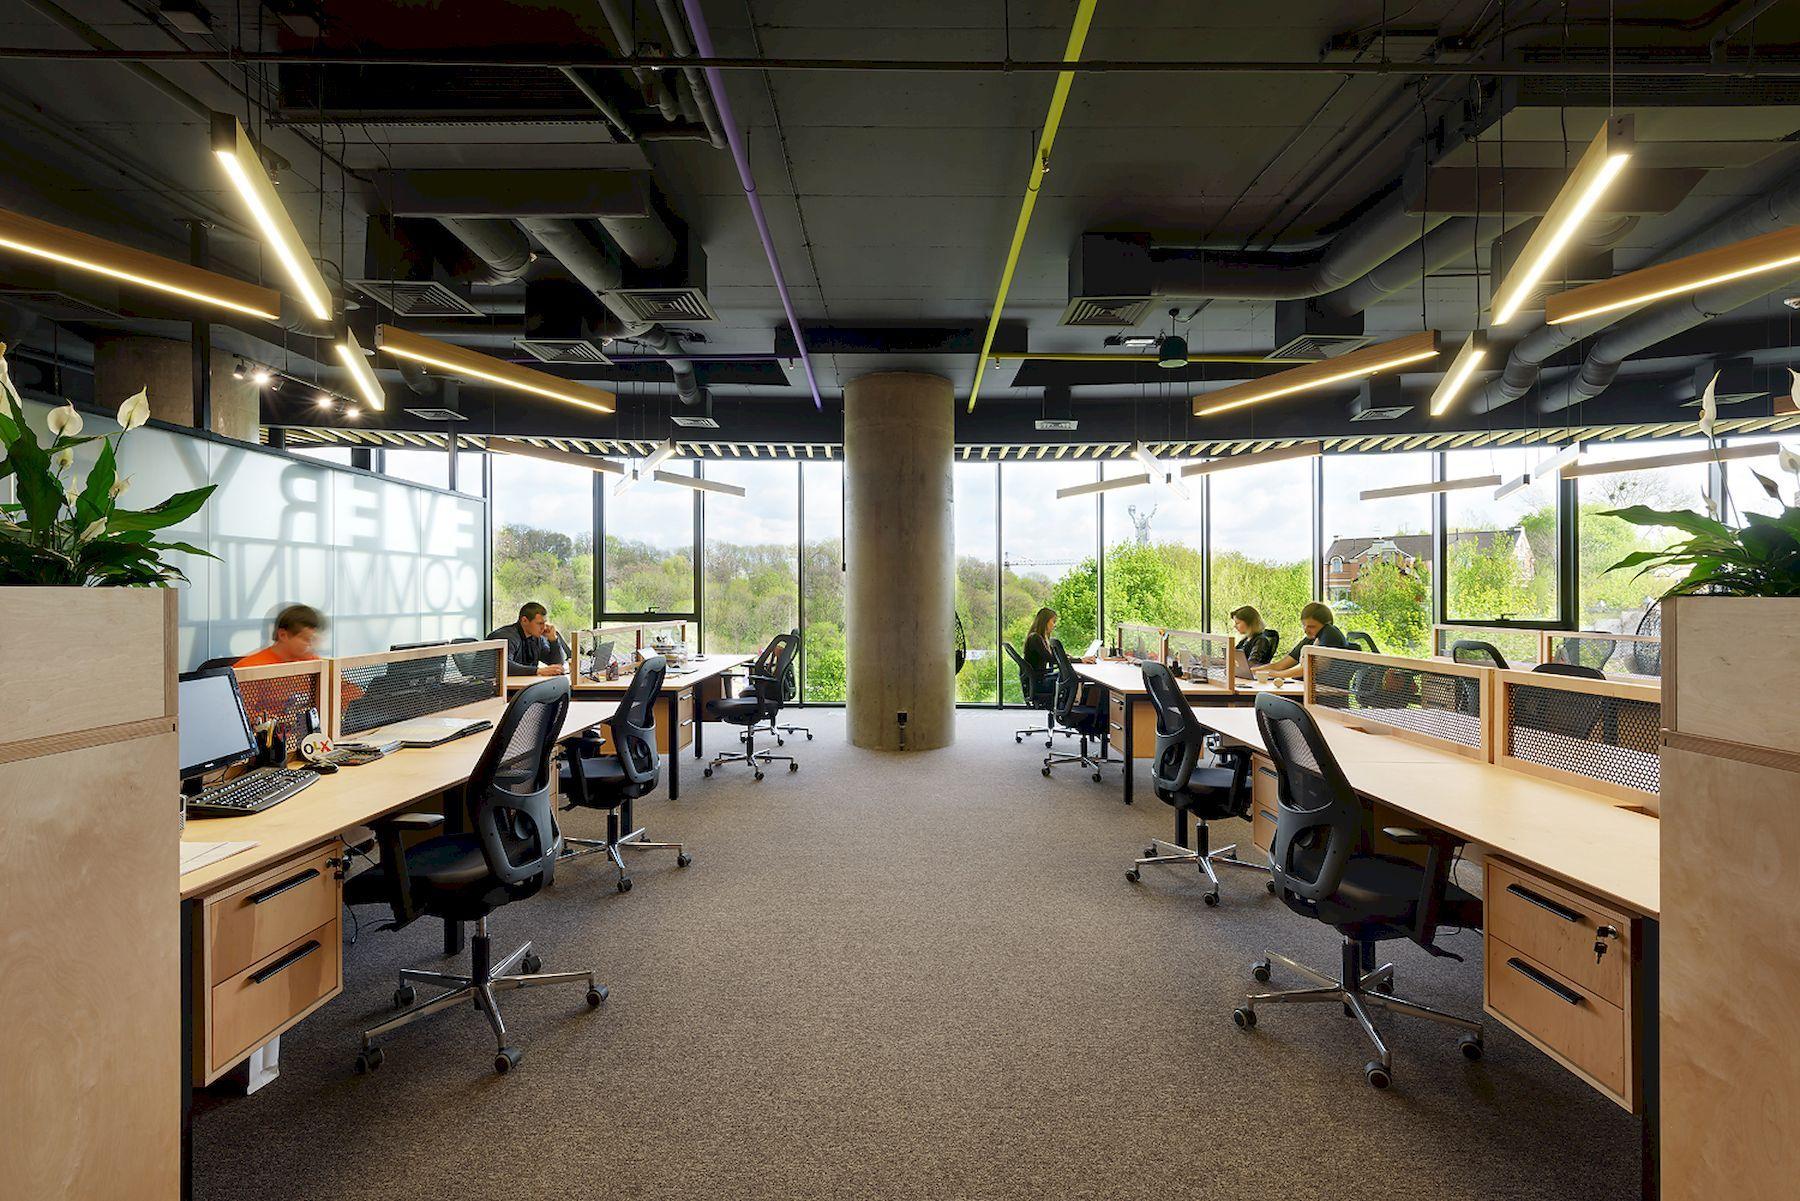 Olx office interior design architecture pinterest